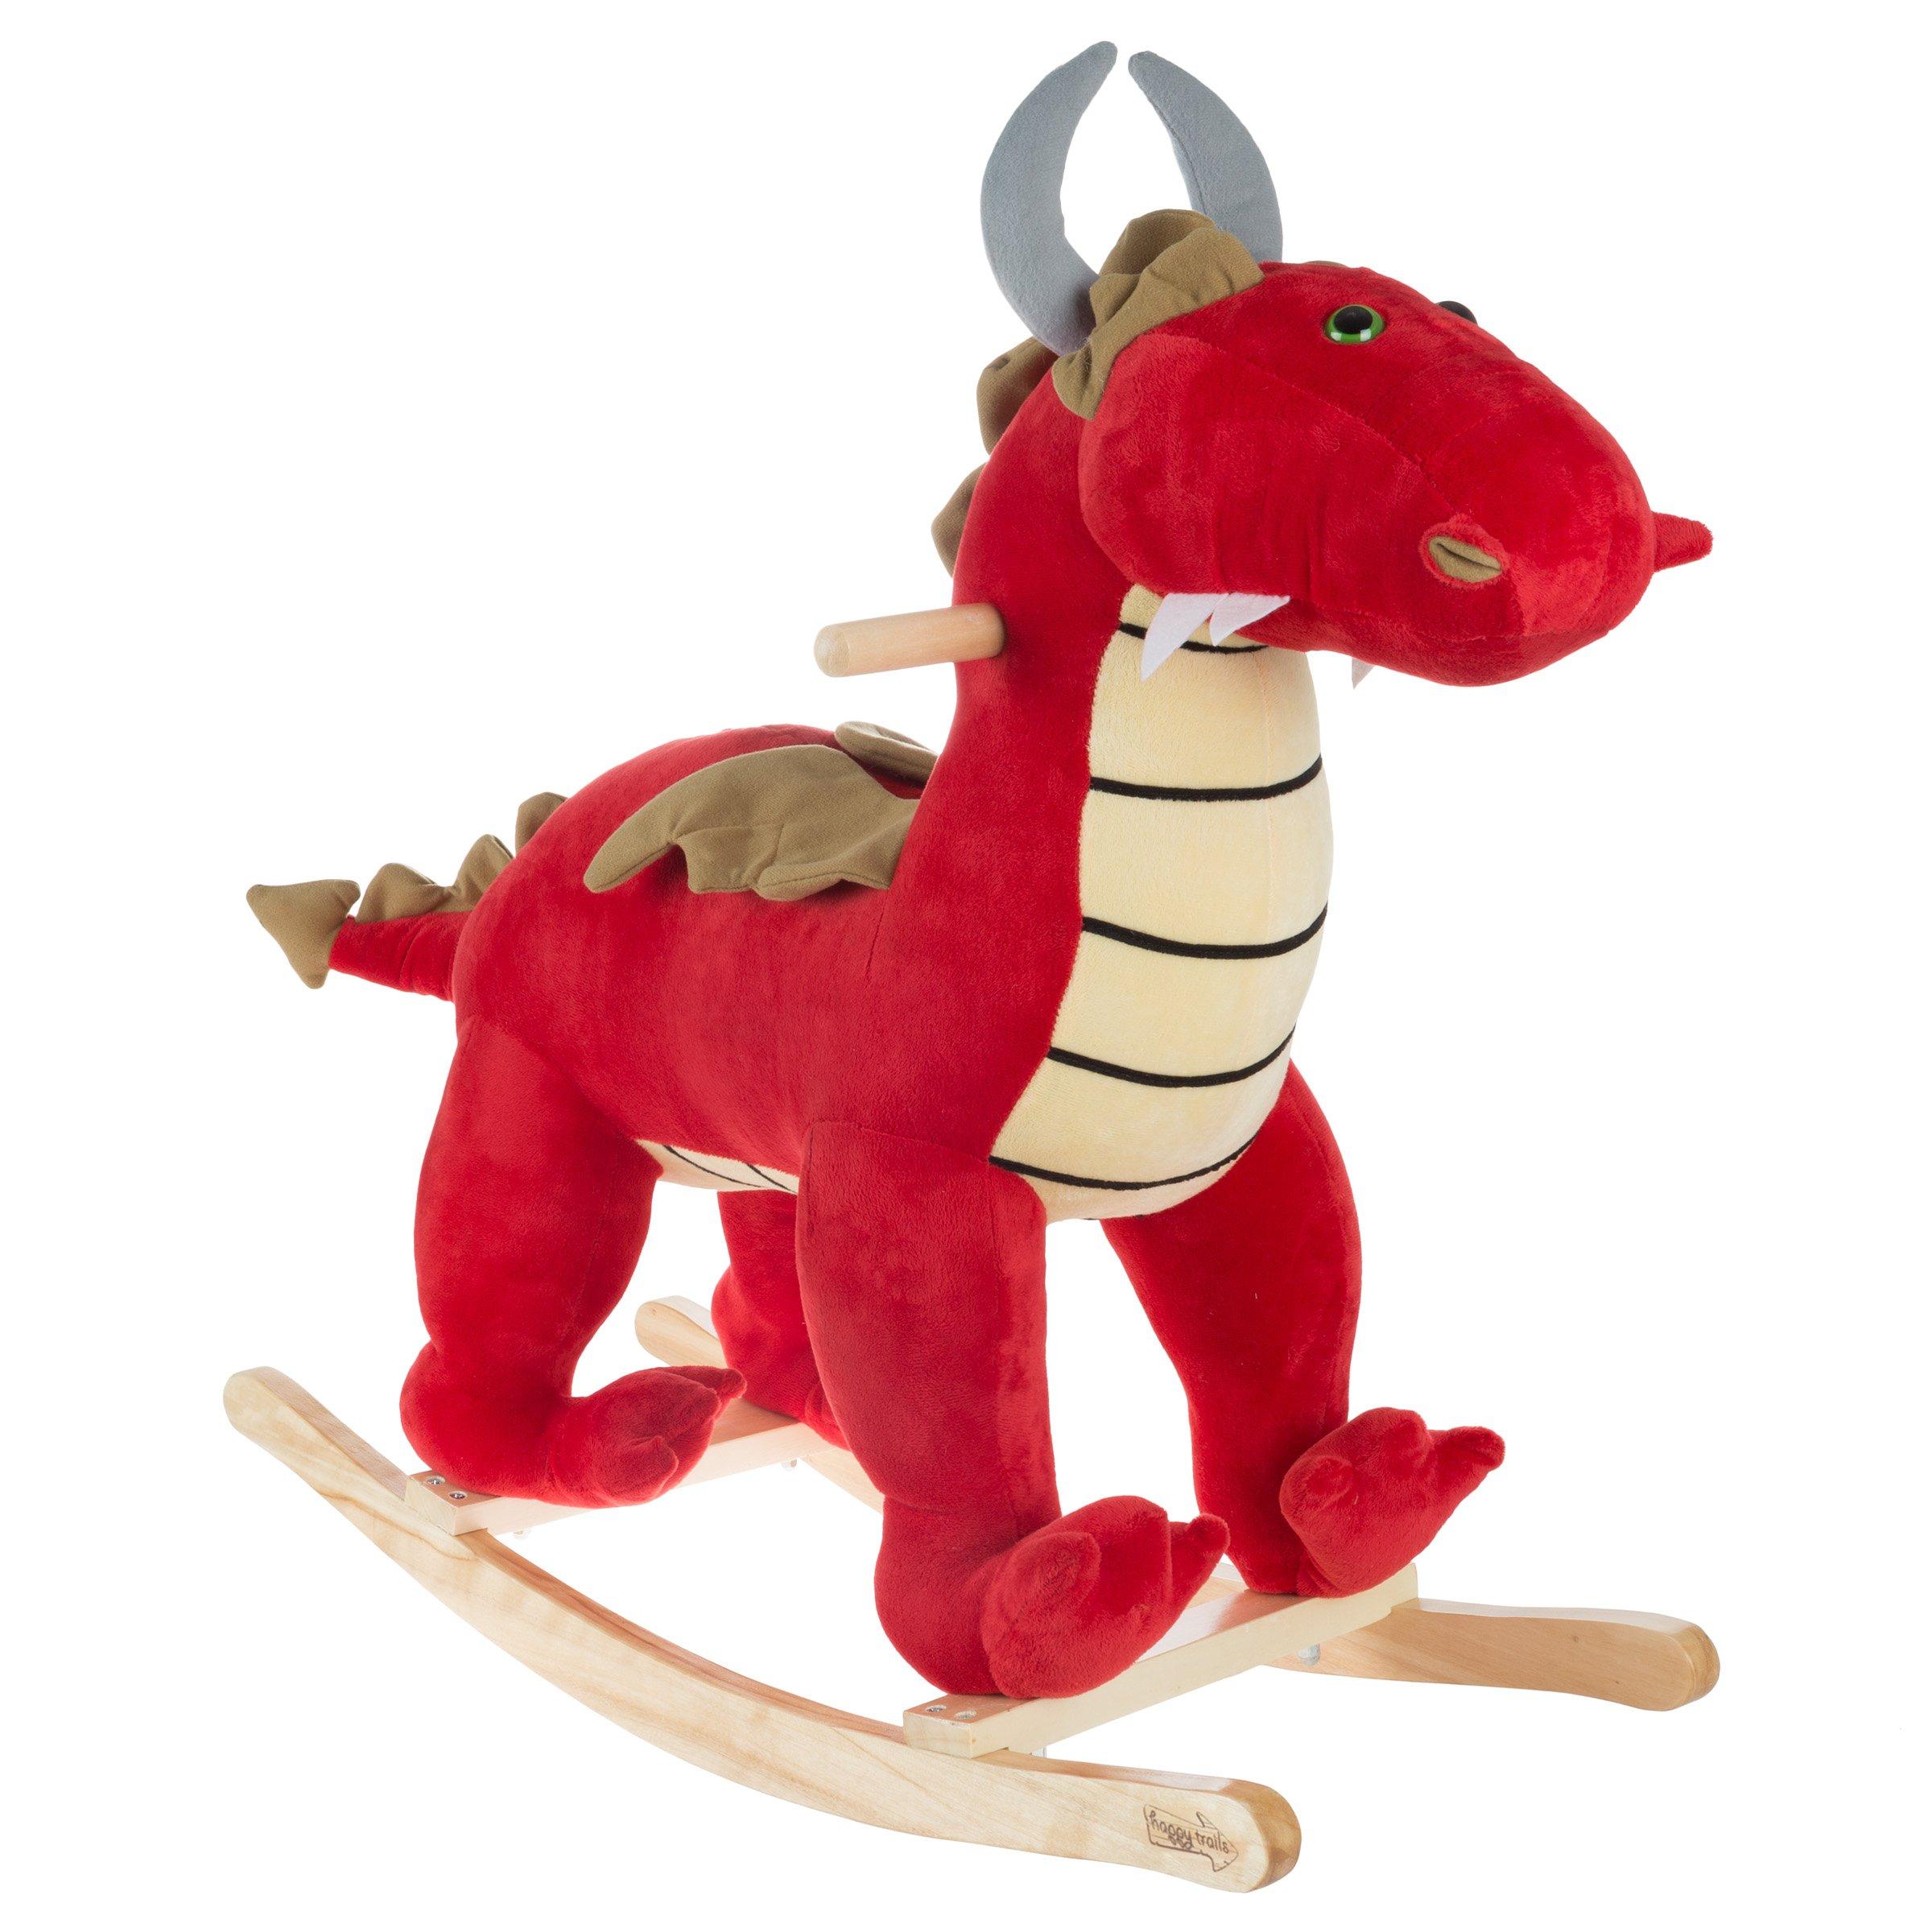 Hey! Play! Rocking Animal Toy Kids Ride on Plush Stuffed Dragon on Wooden Rockers Handles, Fun Boys, Girls, Toddlers (Red)